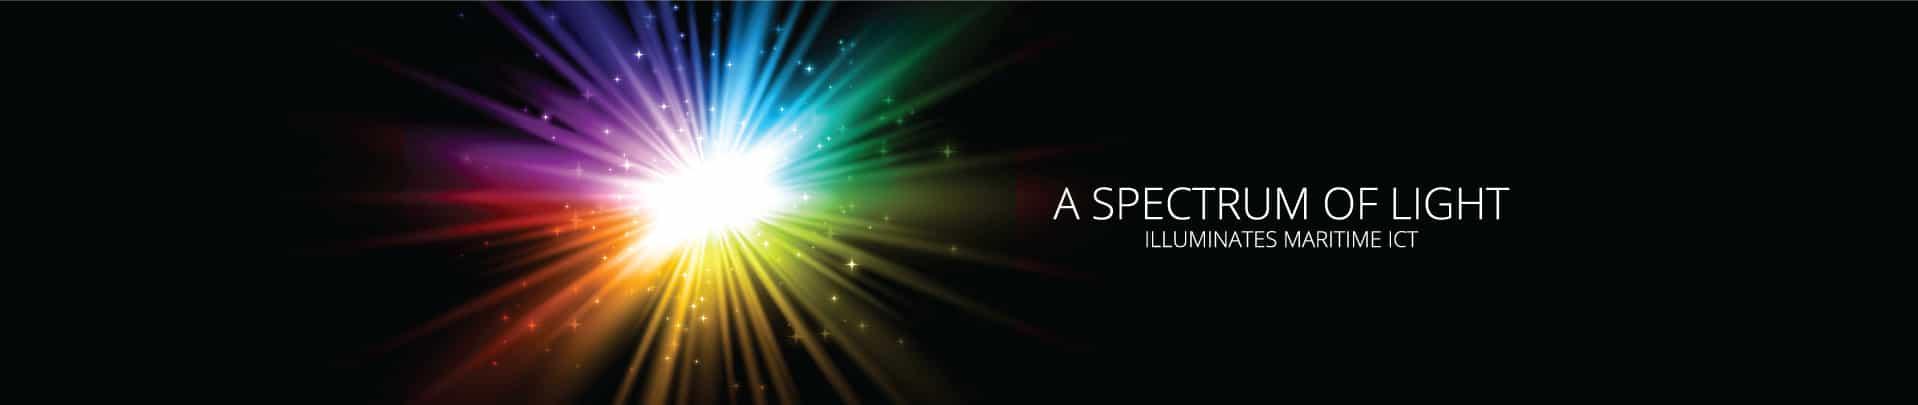 Web-banner_spectrum